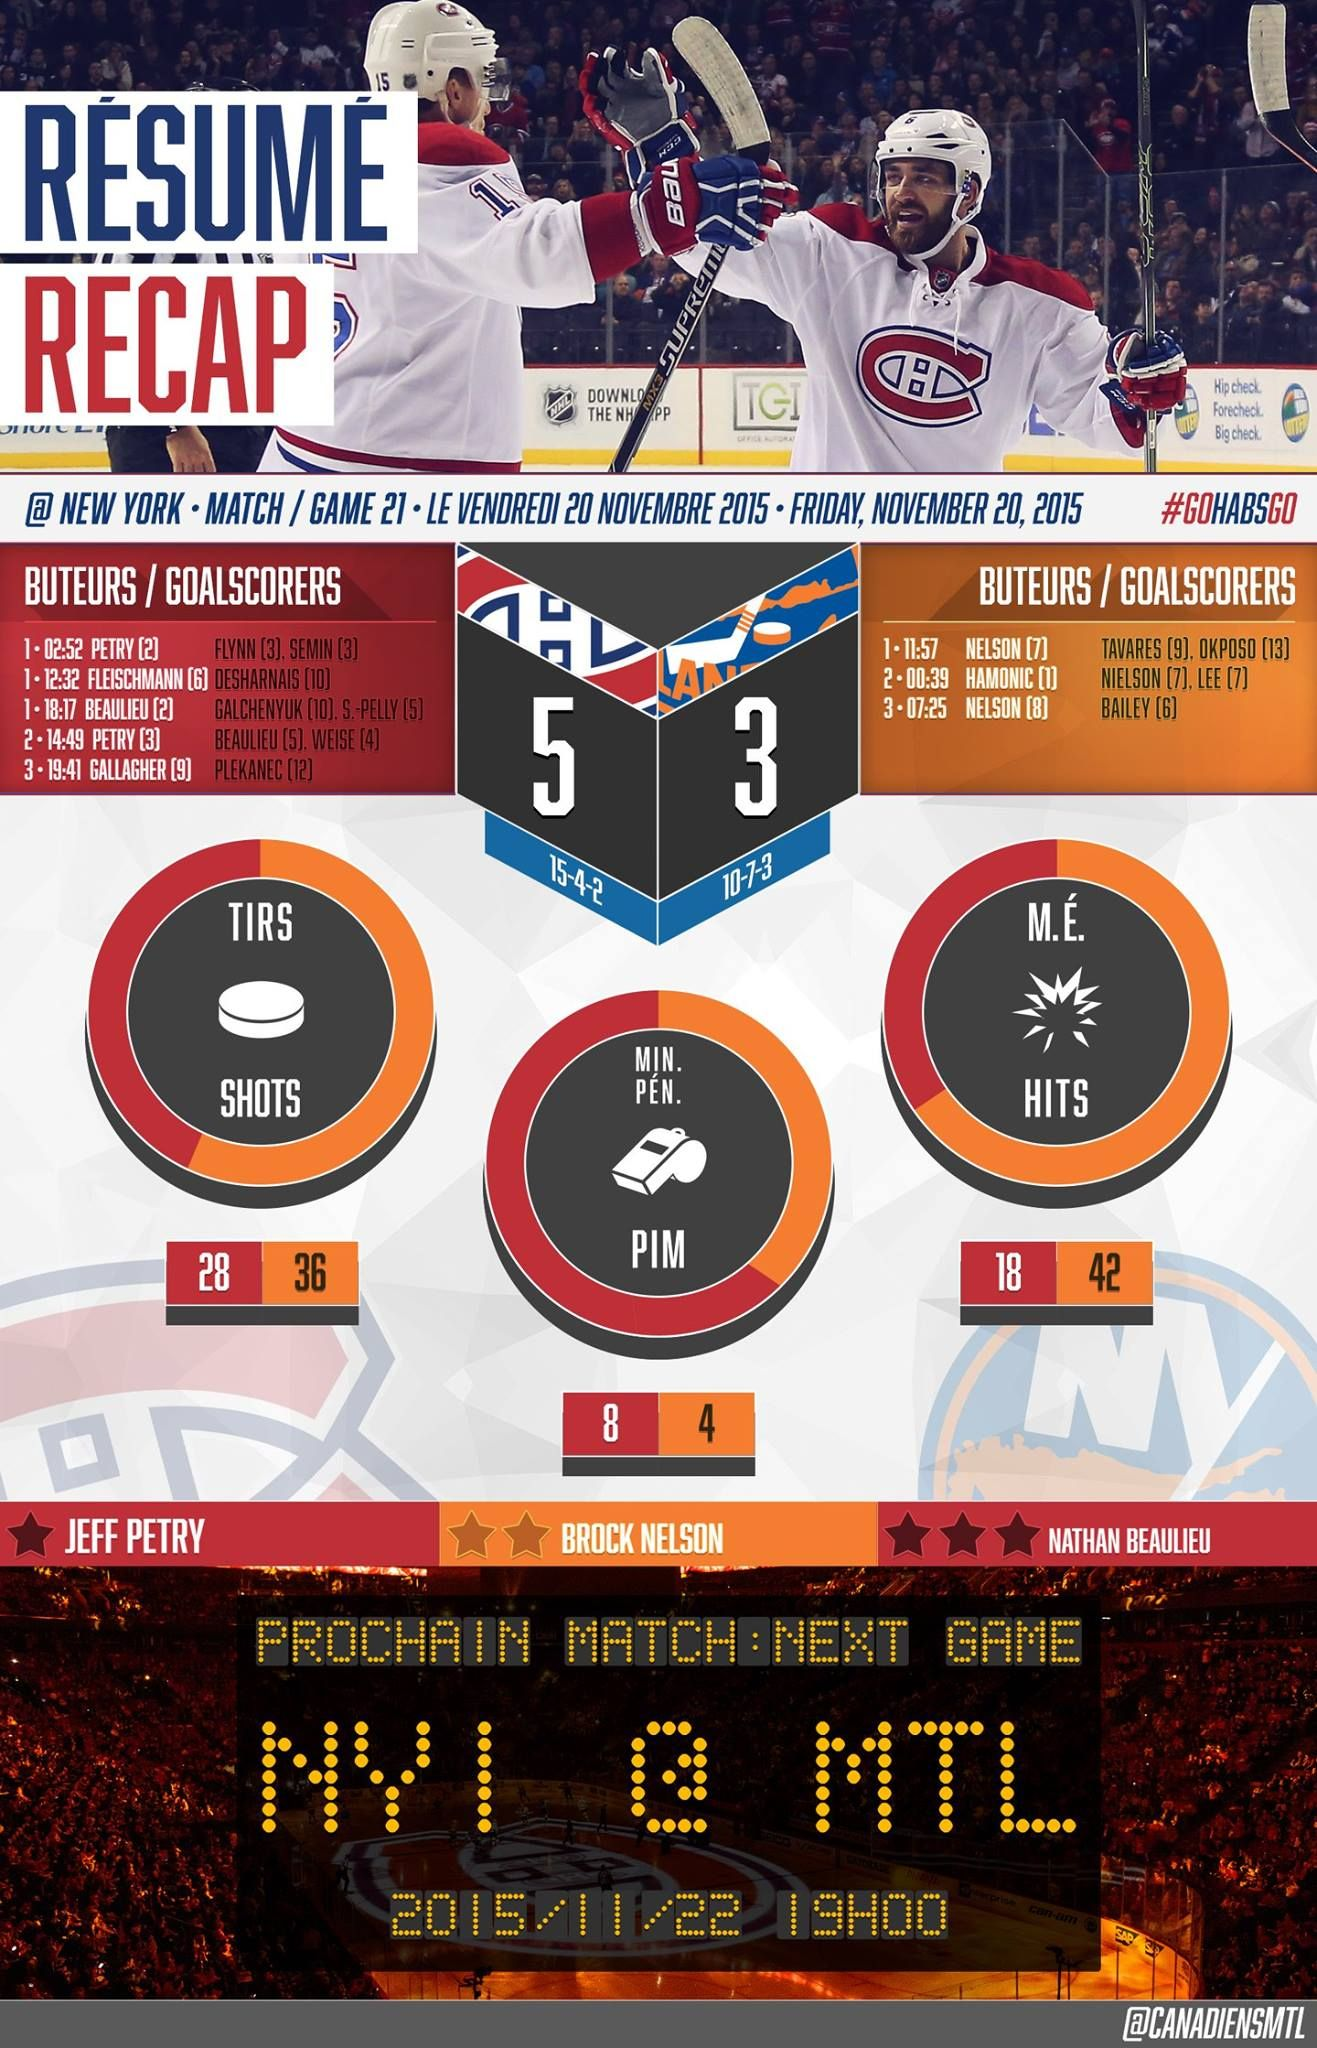 Official Montréal Canadiens Website | NHL.com